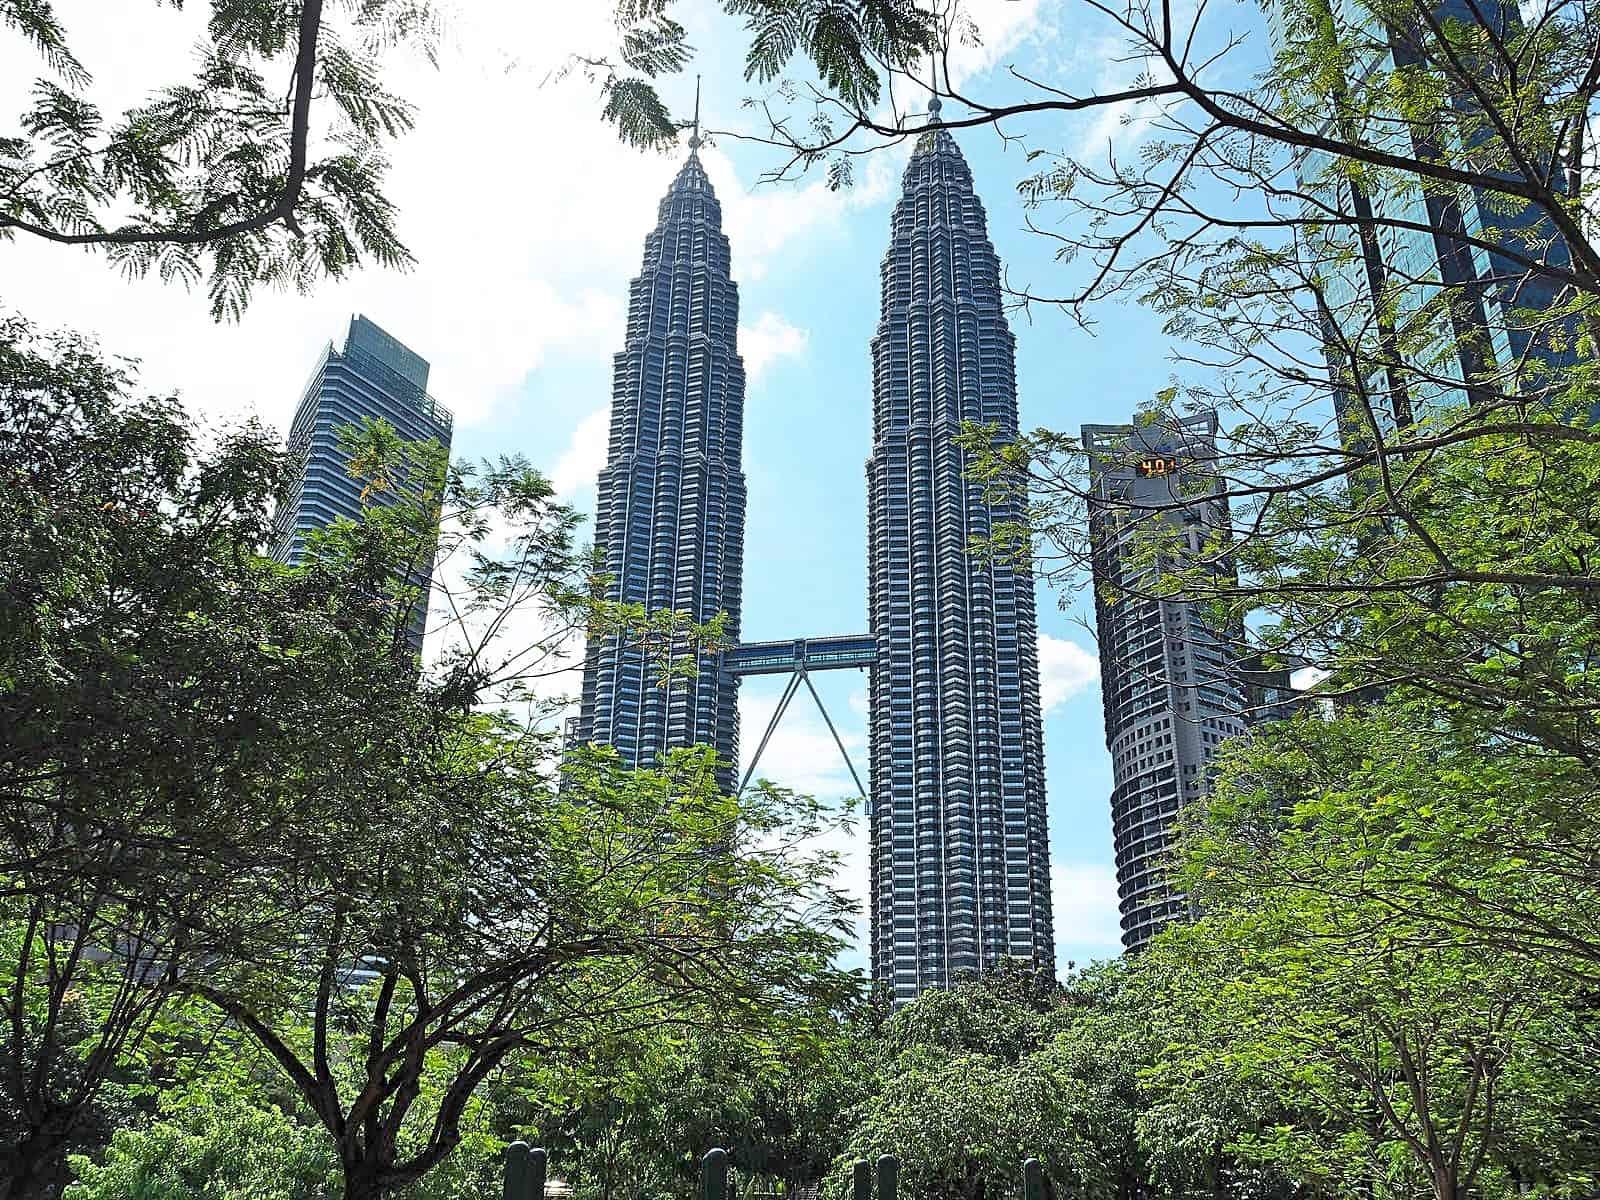 Petronas-Towers-KLCC-Kuala Lumpur-Malaysia-Travel-Mermaid-08